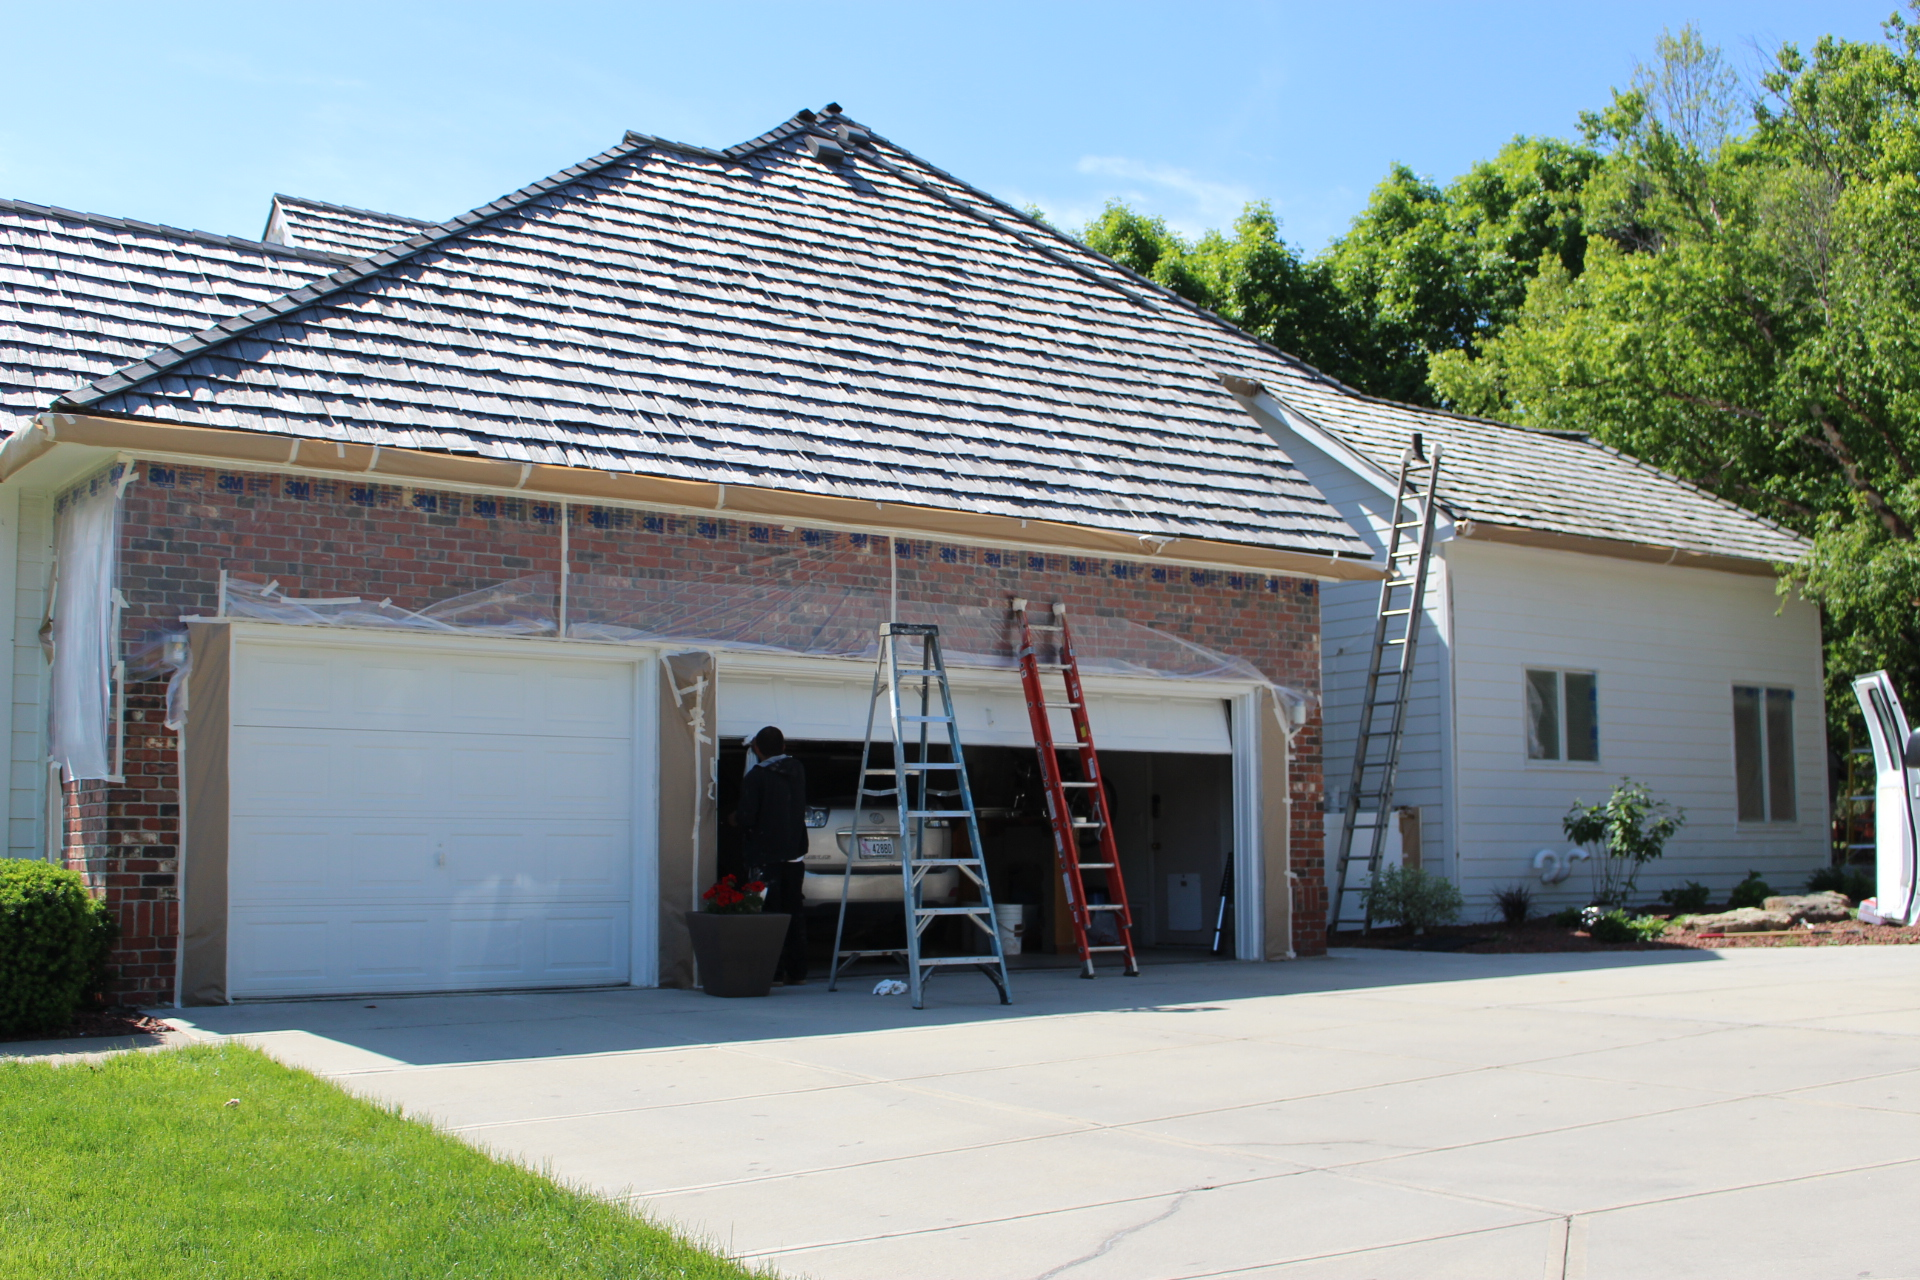 Scott S Painting Amp Staining Inc In Omaha Ne 68135